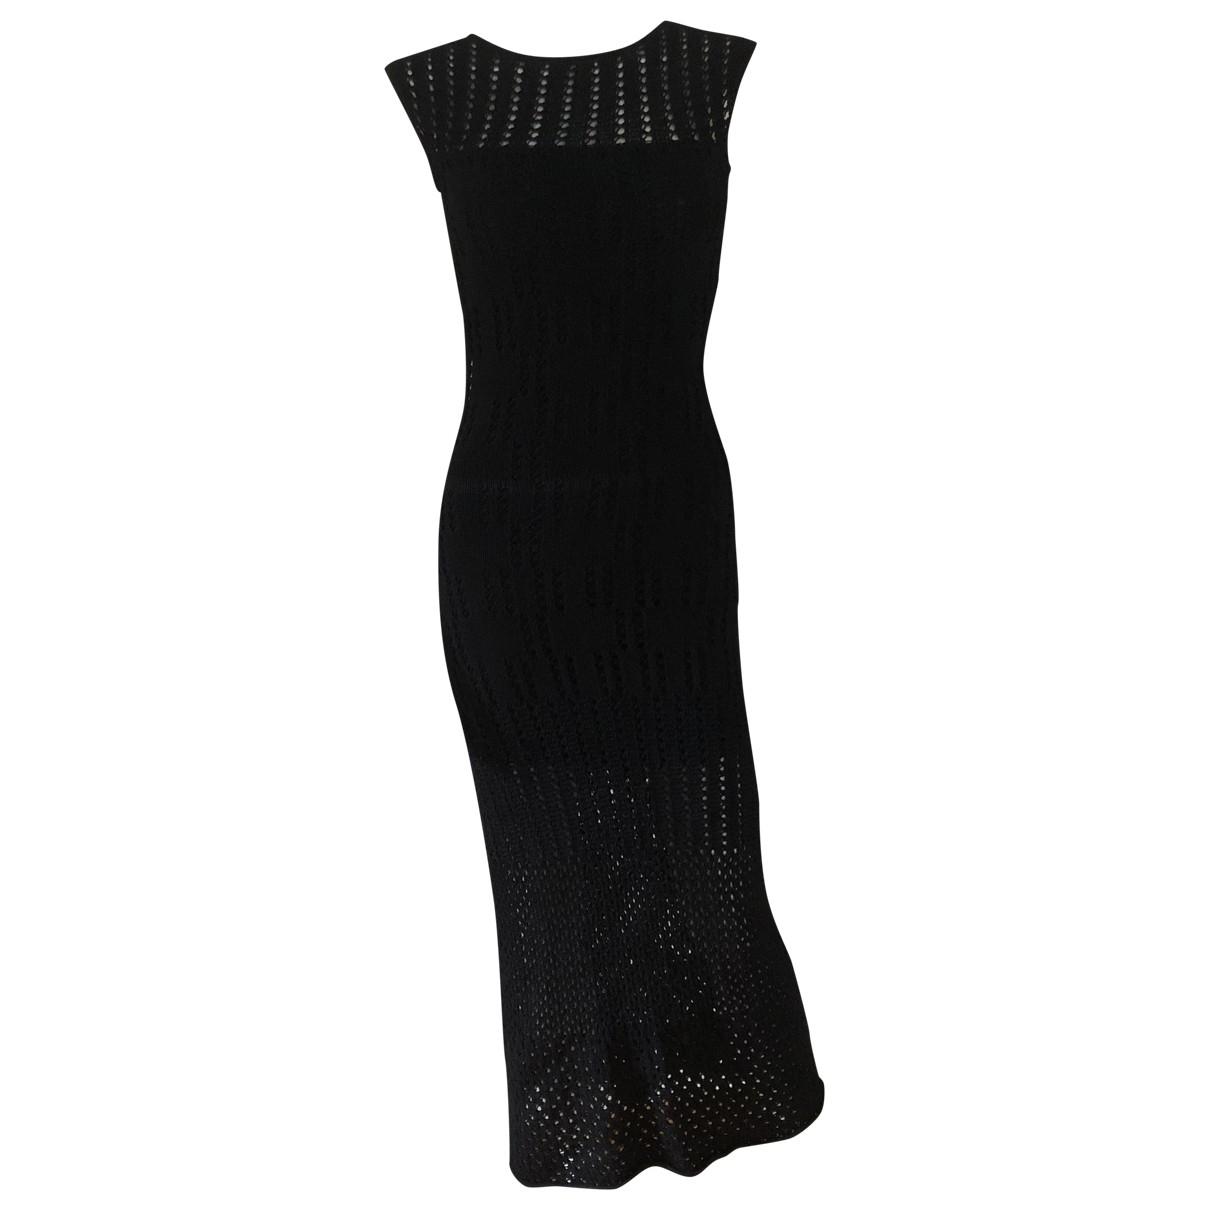 Catherine Malandrino \N Black dress for Women XS International